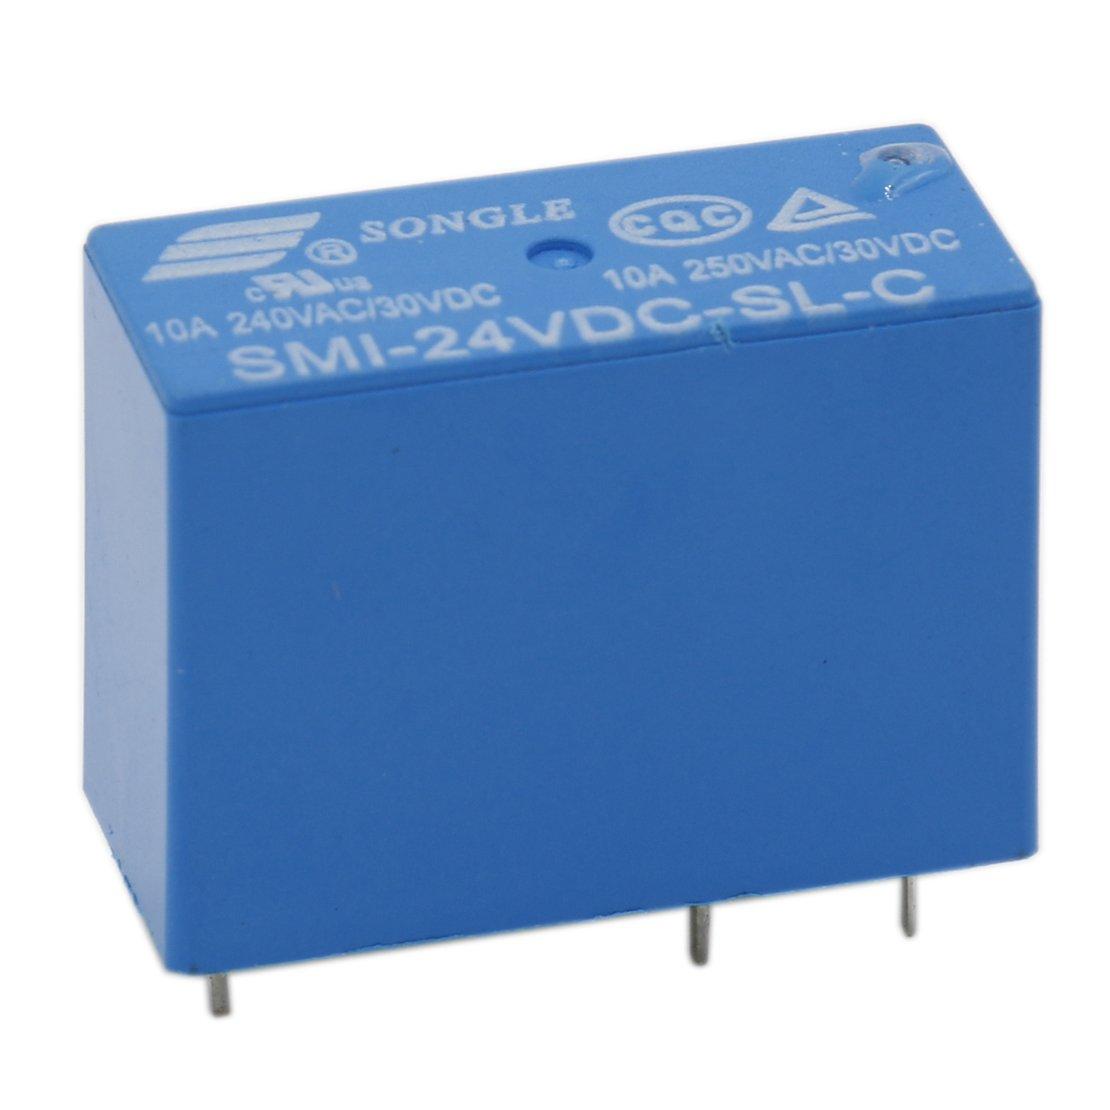 Heschen Relé de placa para PC SMI-24VDC-SL-C DC 24V Bobina SPDT 10A 250VAC/30VDC 5 pines terminales paquete de 2